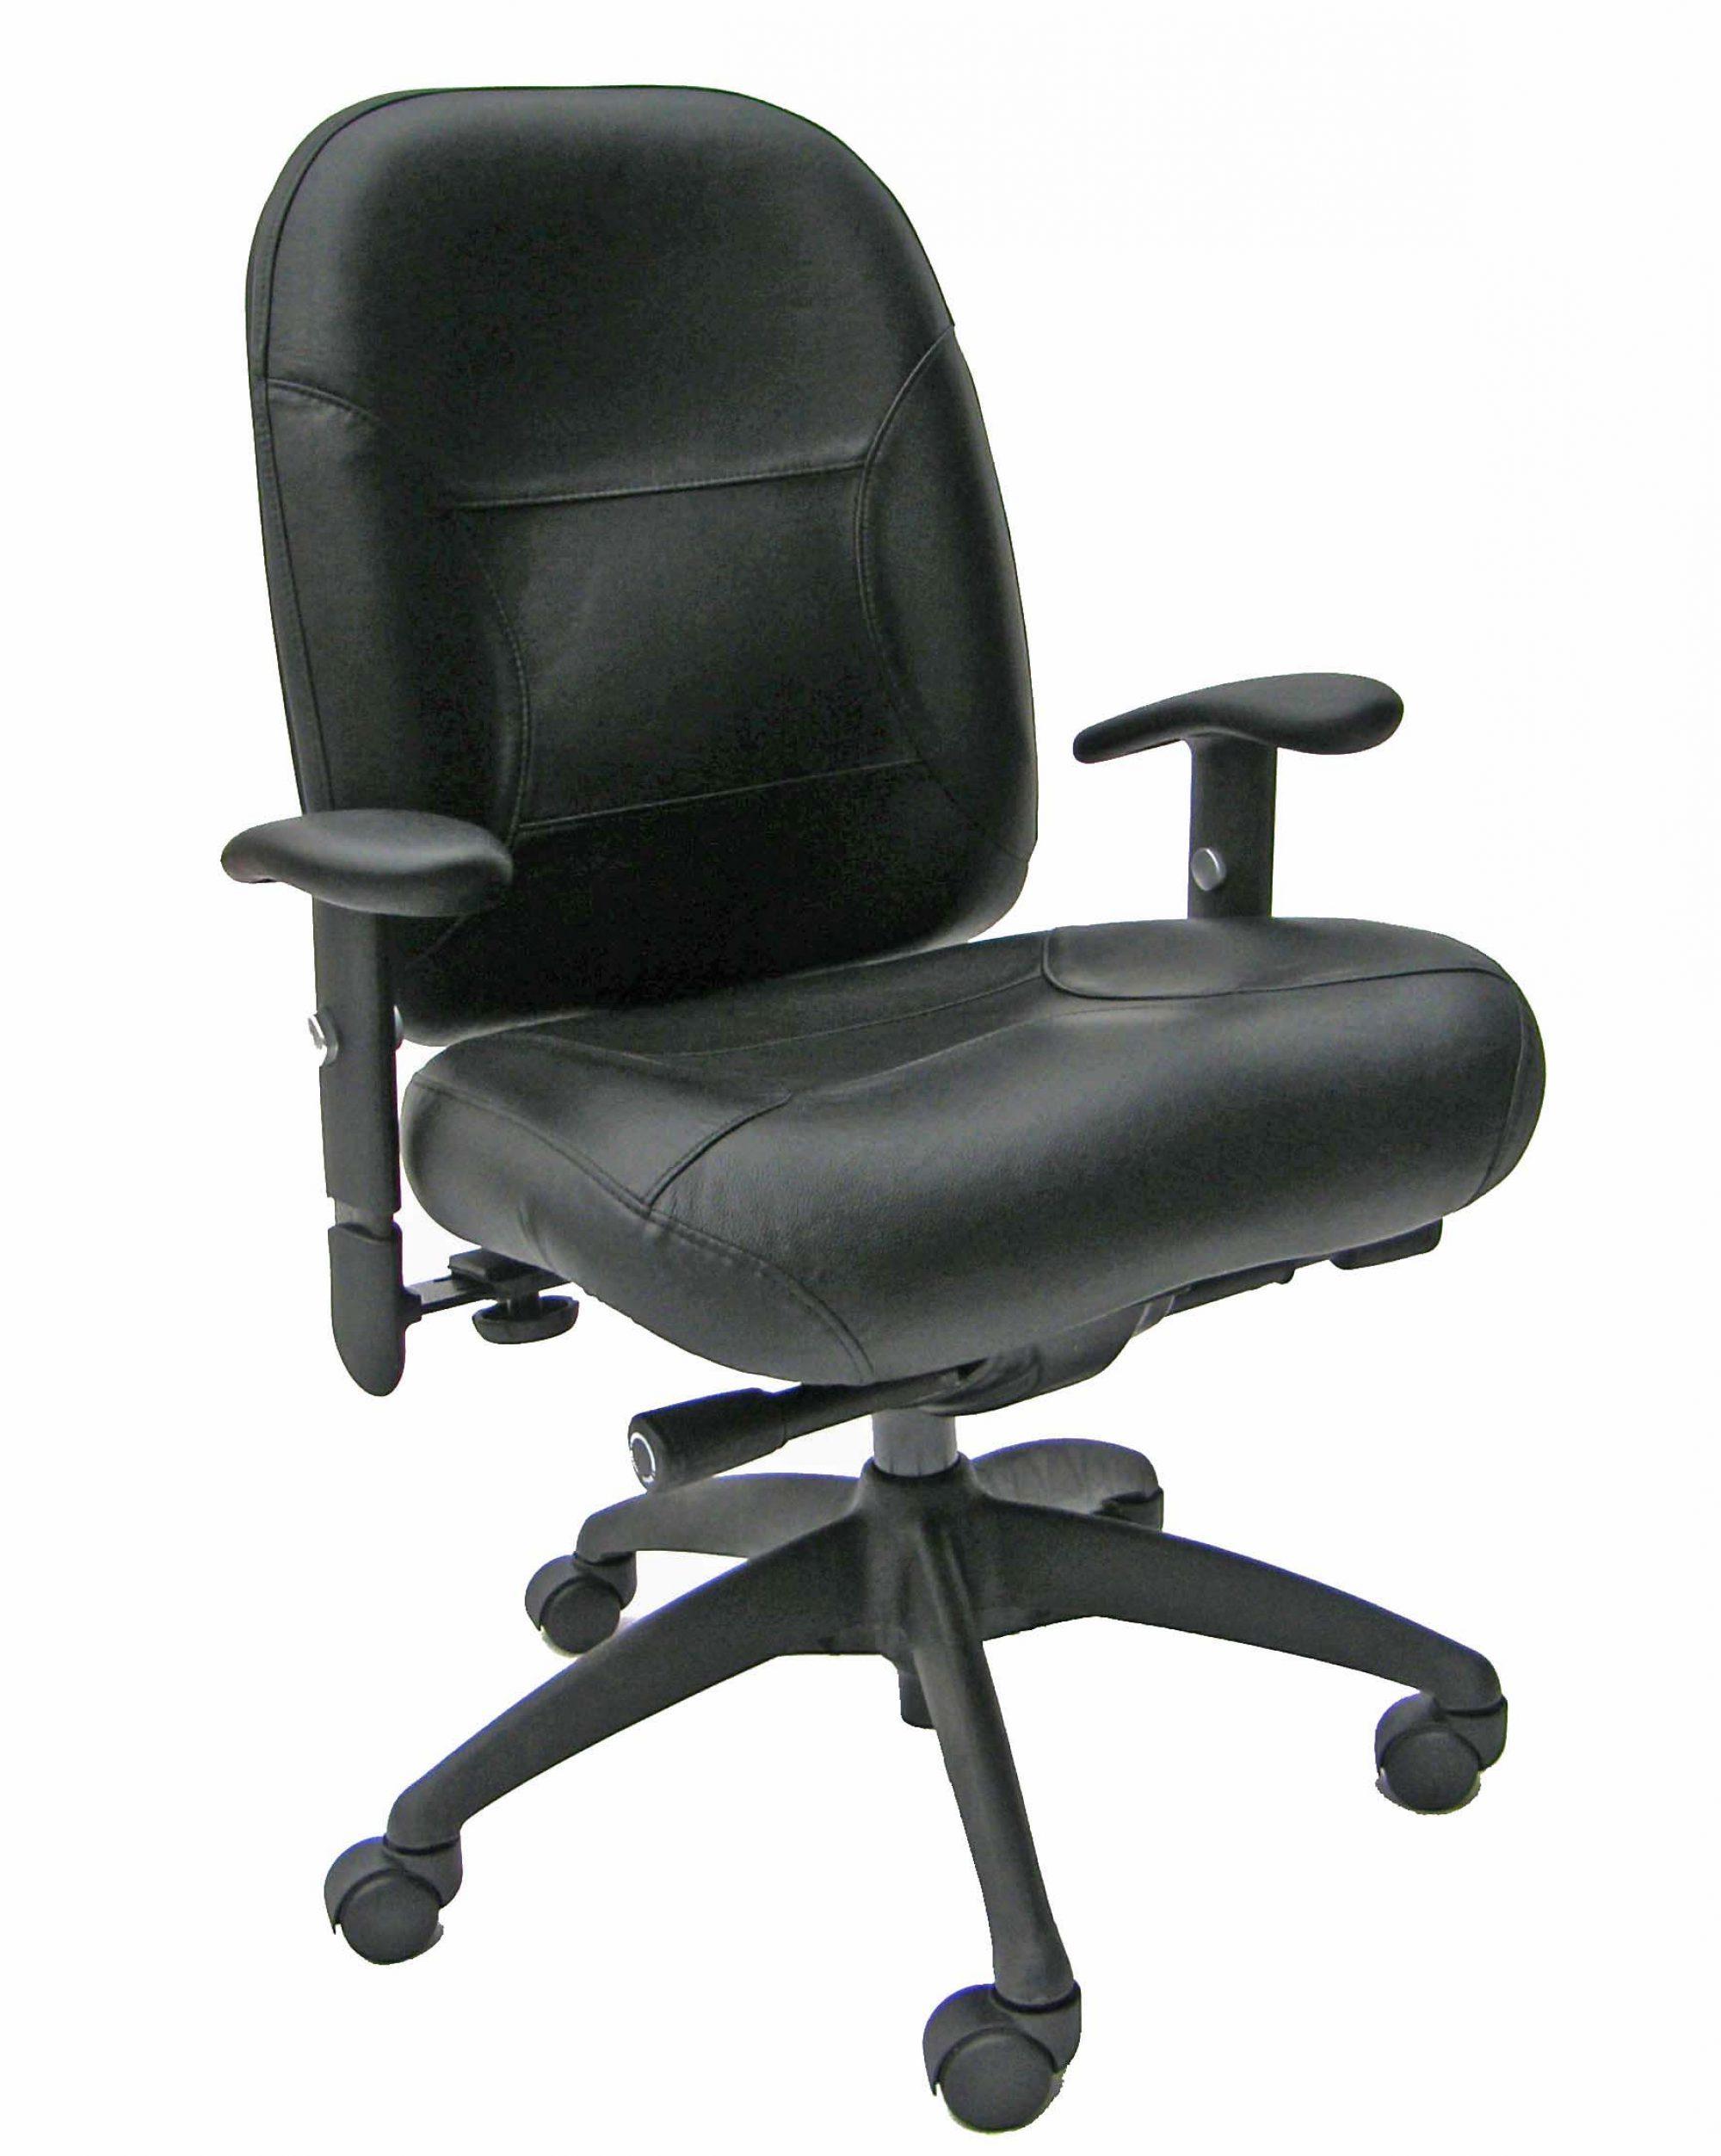 Lovely MVP Extreme Ergonomic Chair BLACK LEATHER